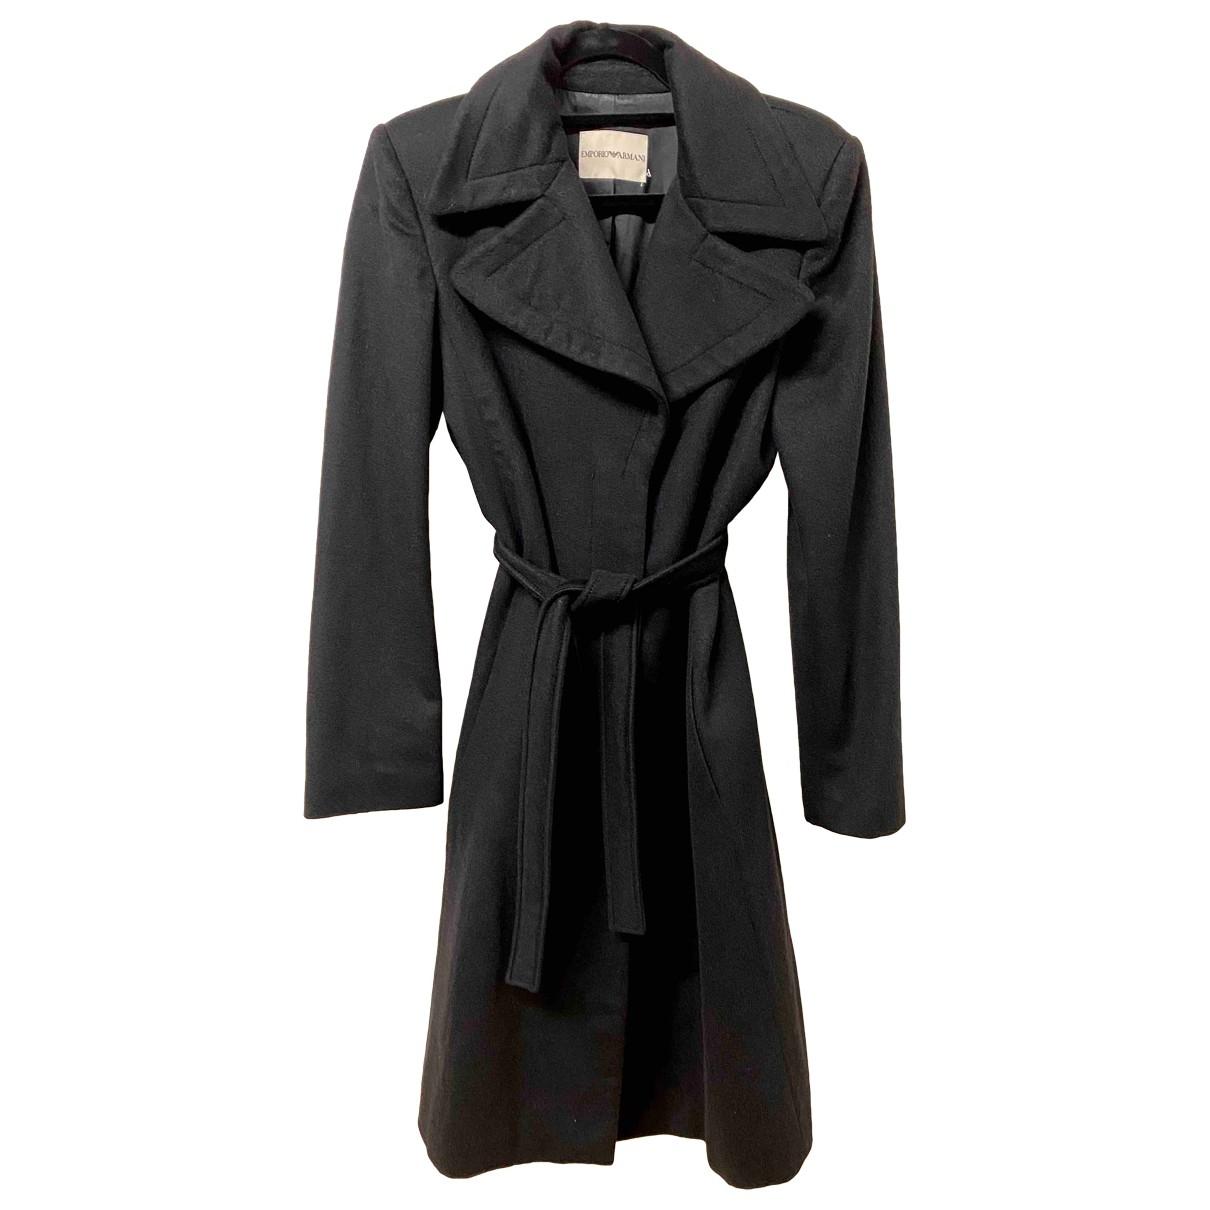 Emporio Armani \N Black Cashmere coat for Women 46 IT